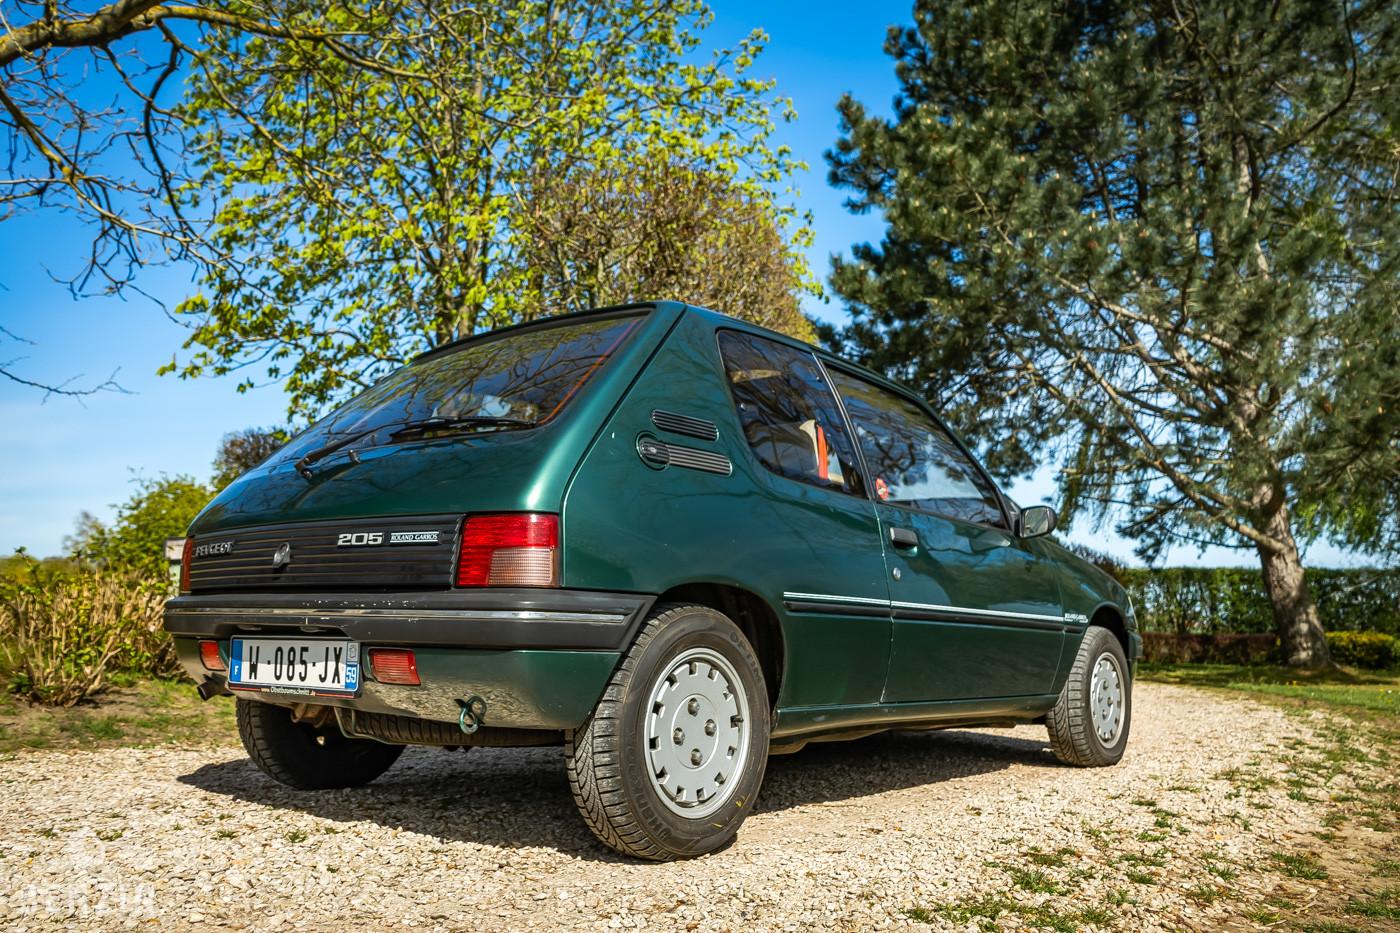 Peugeot 205 Roland Garros occasion à vendre se vende for sale te koop zu verkaufen